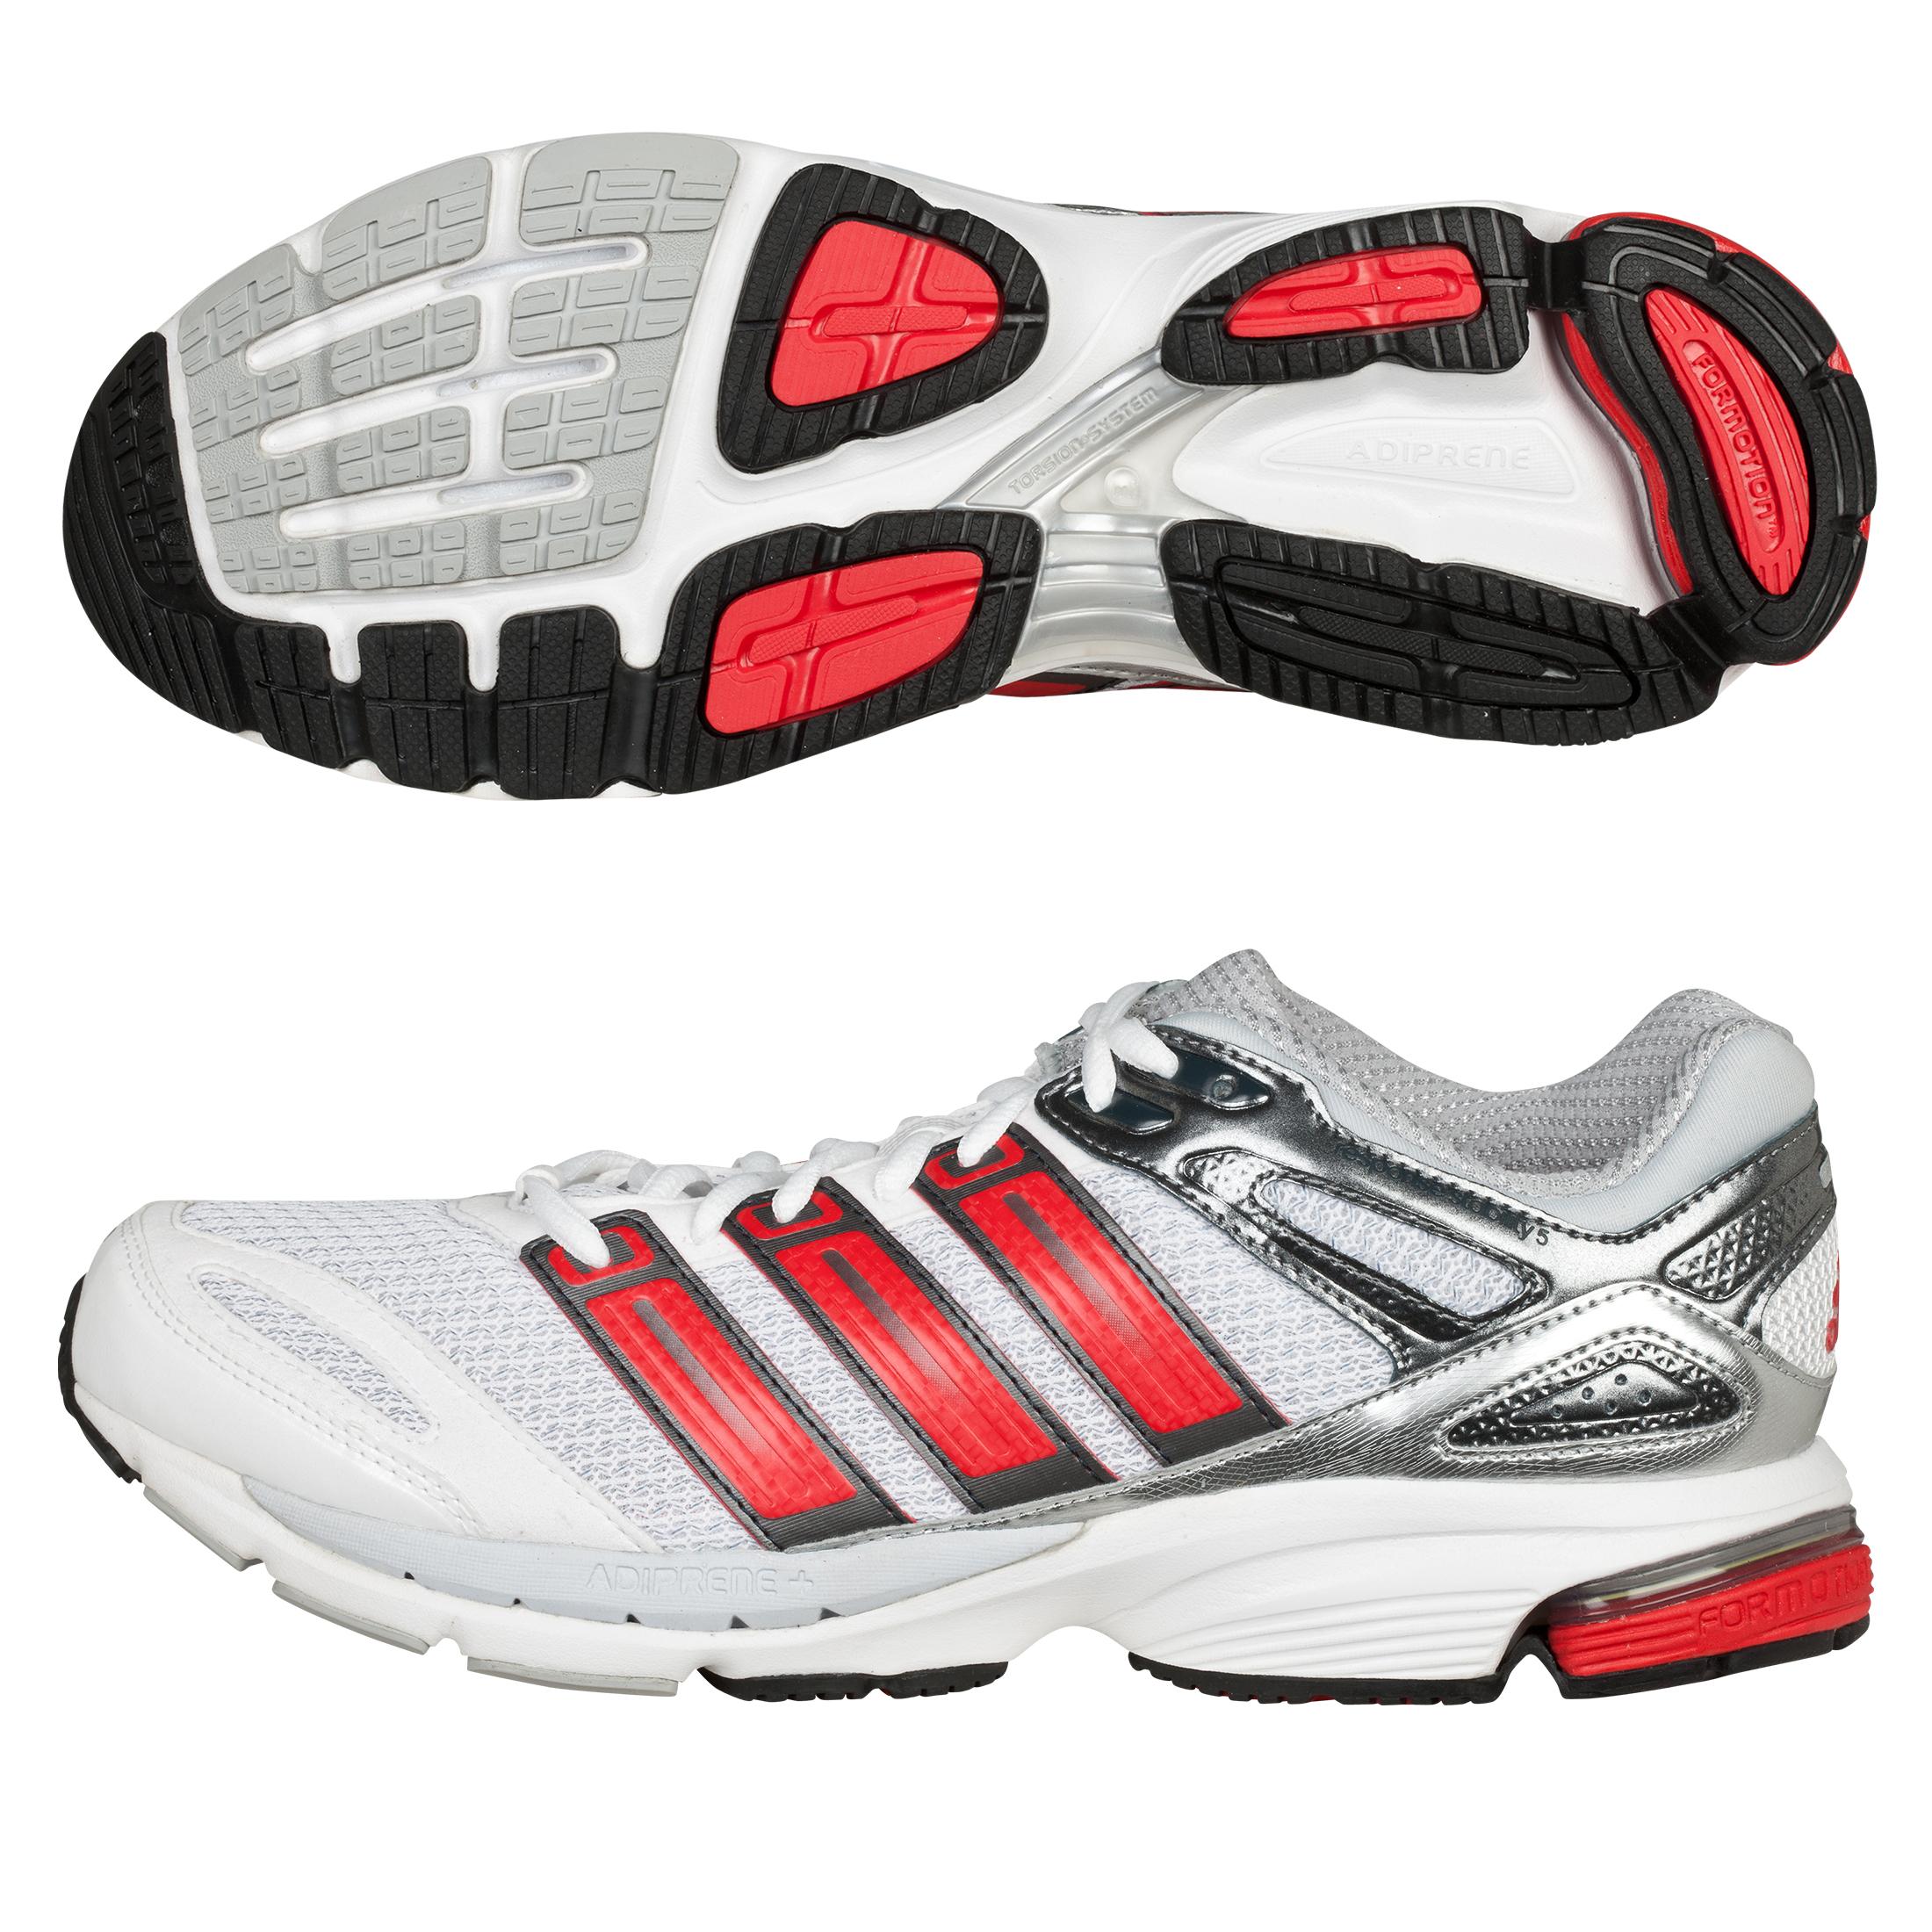 Adidas Response Stability 5 Trainers - White/Vivid Red/Neo Iron